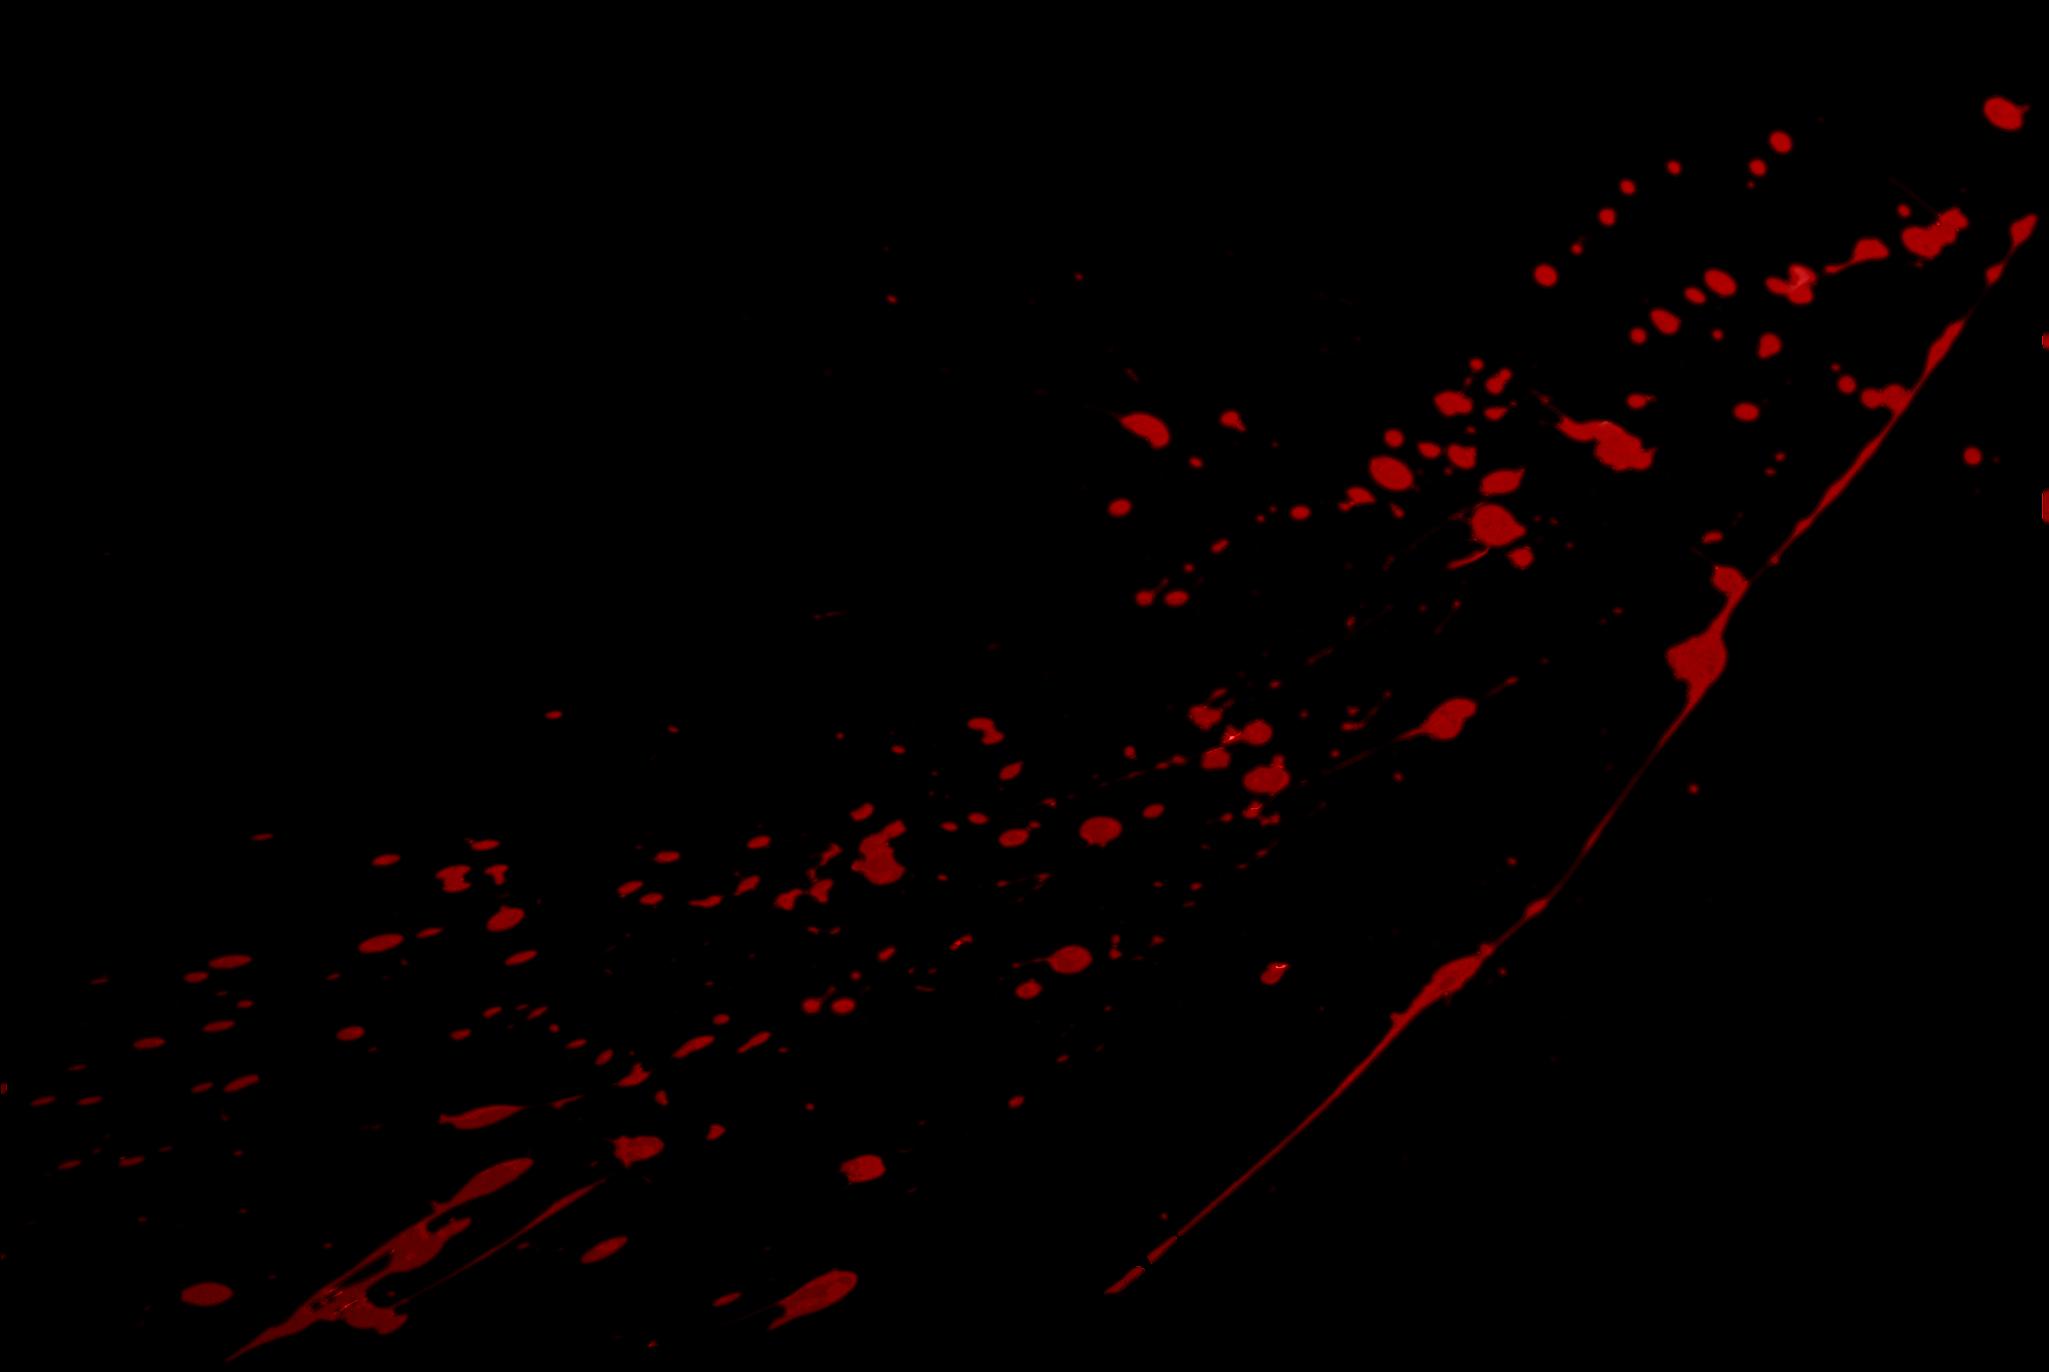 Hd Https S3 Amazonaws Com Files D20 Blood Splatter Clipart Transparent Cartoon Jing Fm